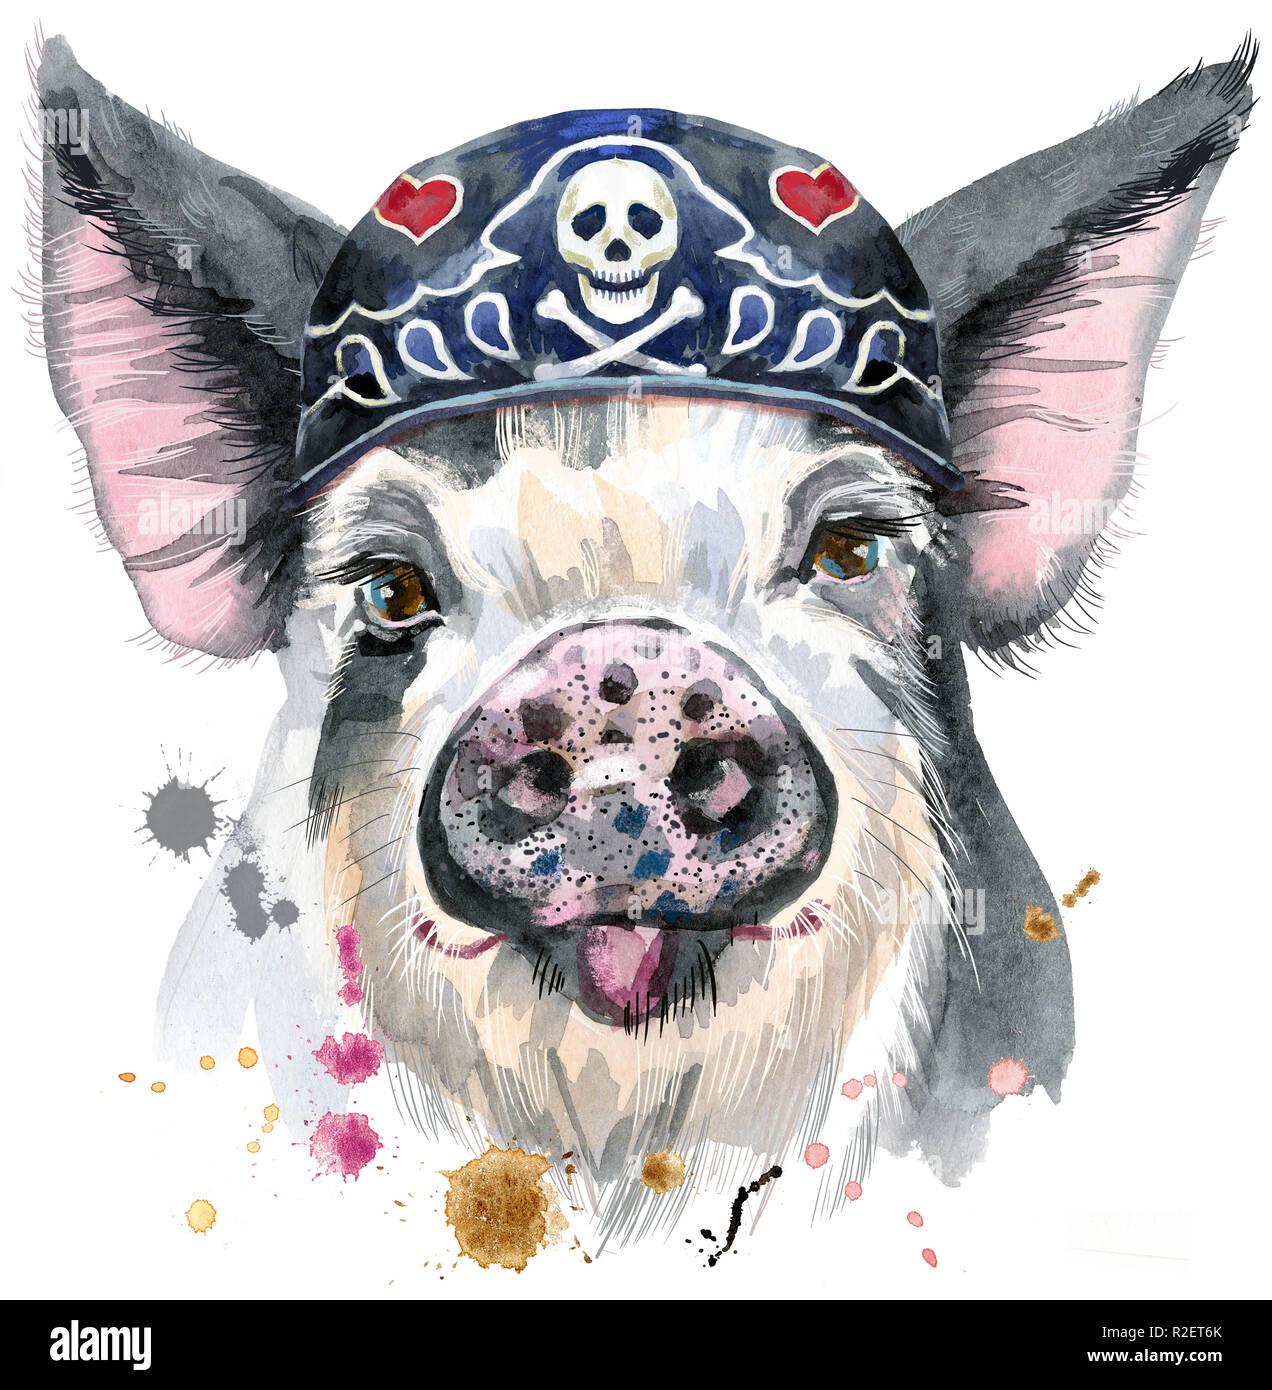 Cute piggy wearing biker bandana. Pig for T-shirt graphics. Watercolor pig in black spots illustration - Stock Image